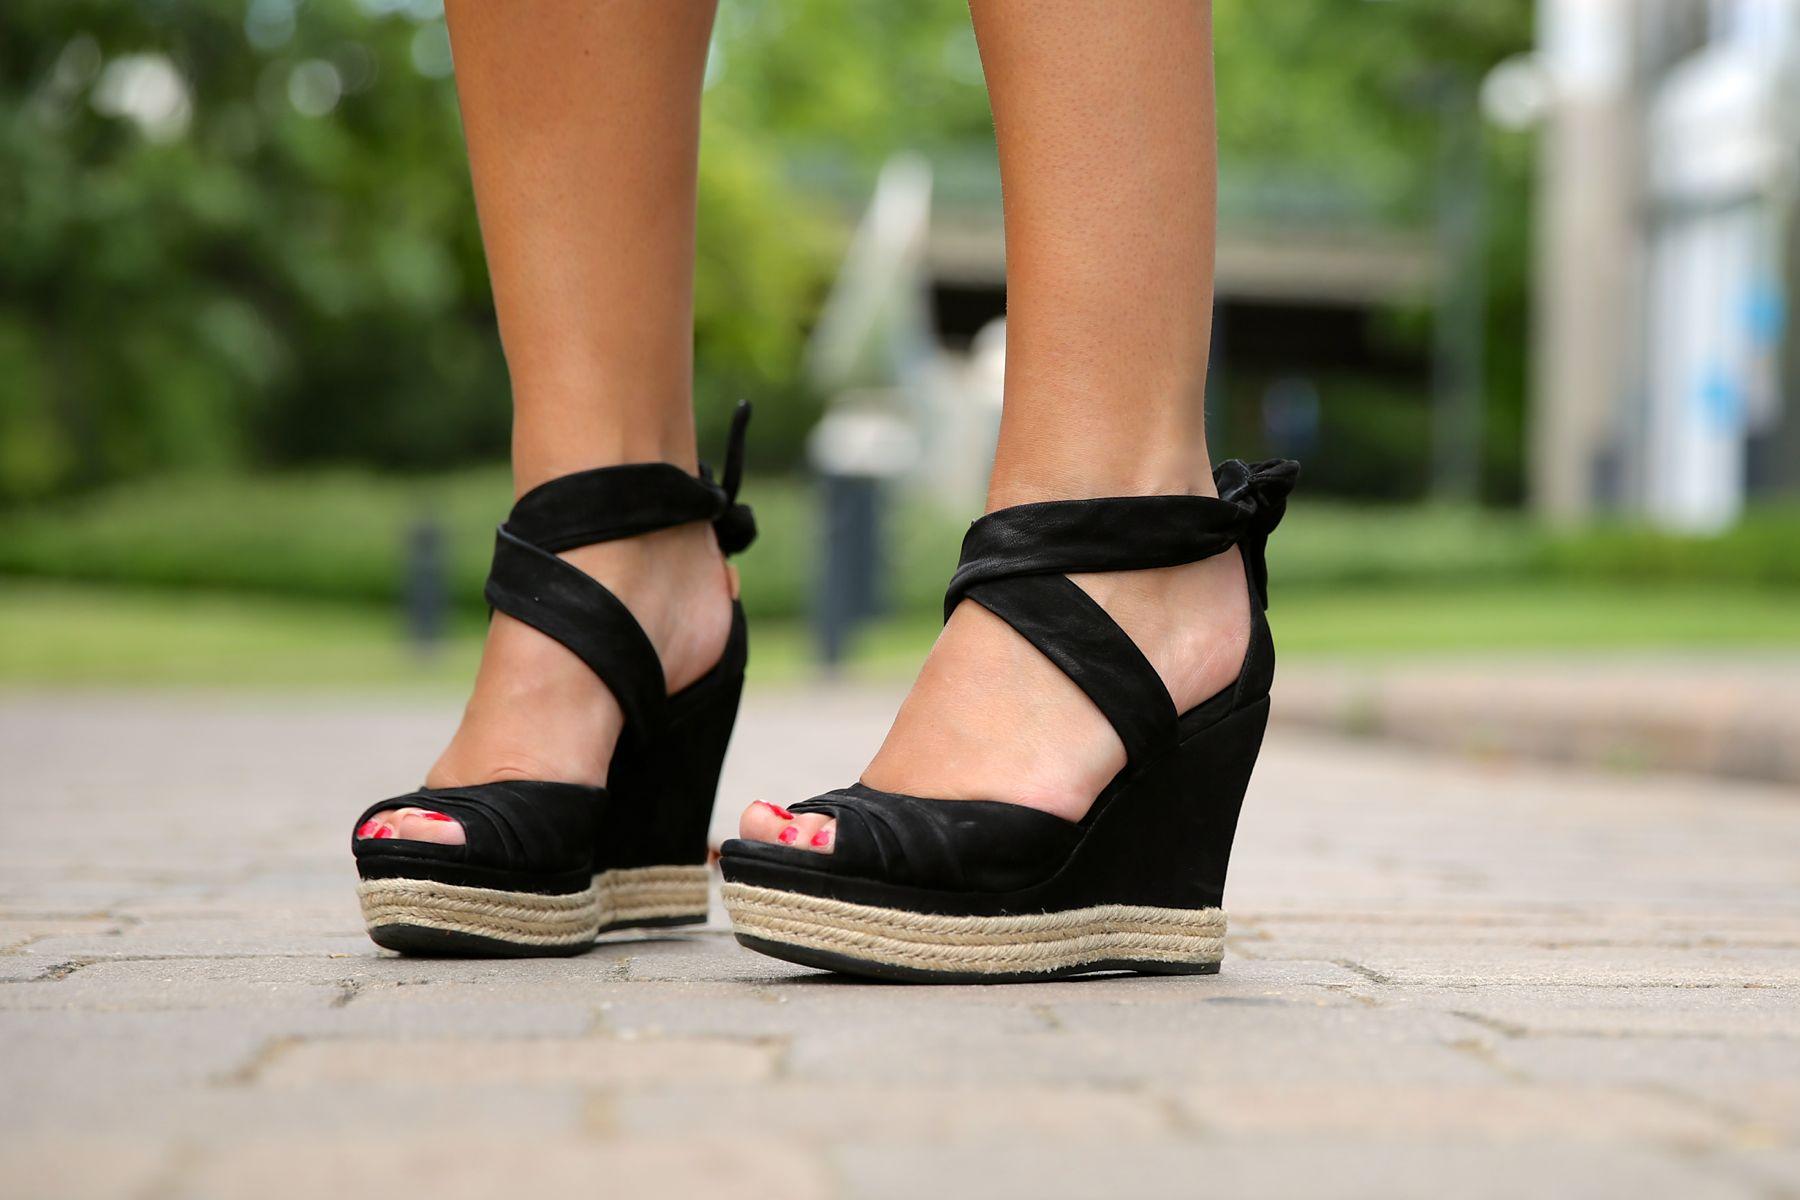 trendy_taste-look-outfit-street_style-ootd-blog-blogger-fashion_spain-moda_españa-fringed_bag-bolso_flecos-sandalias-verano-summer_sandals-ugg_australia-denim_shorts-shorts_vaqueros-oversize-1